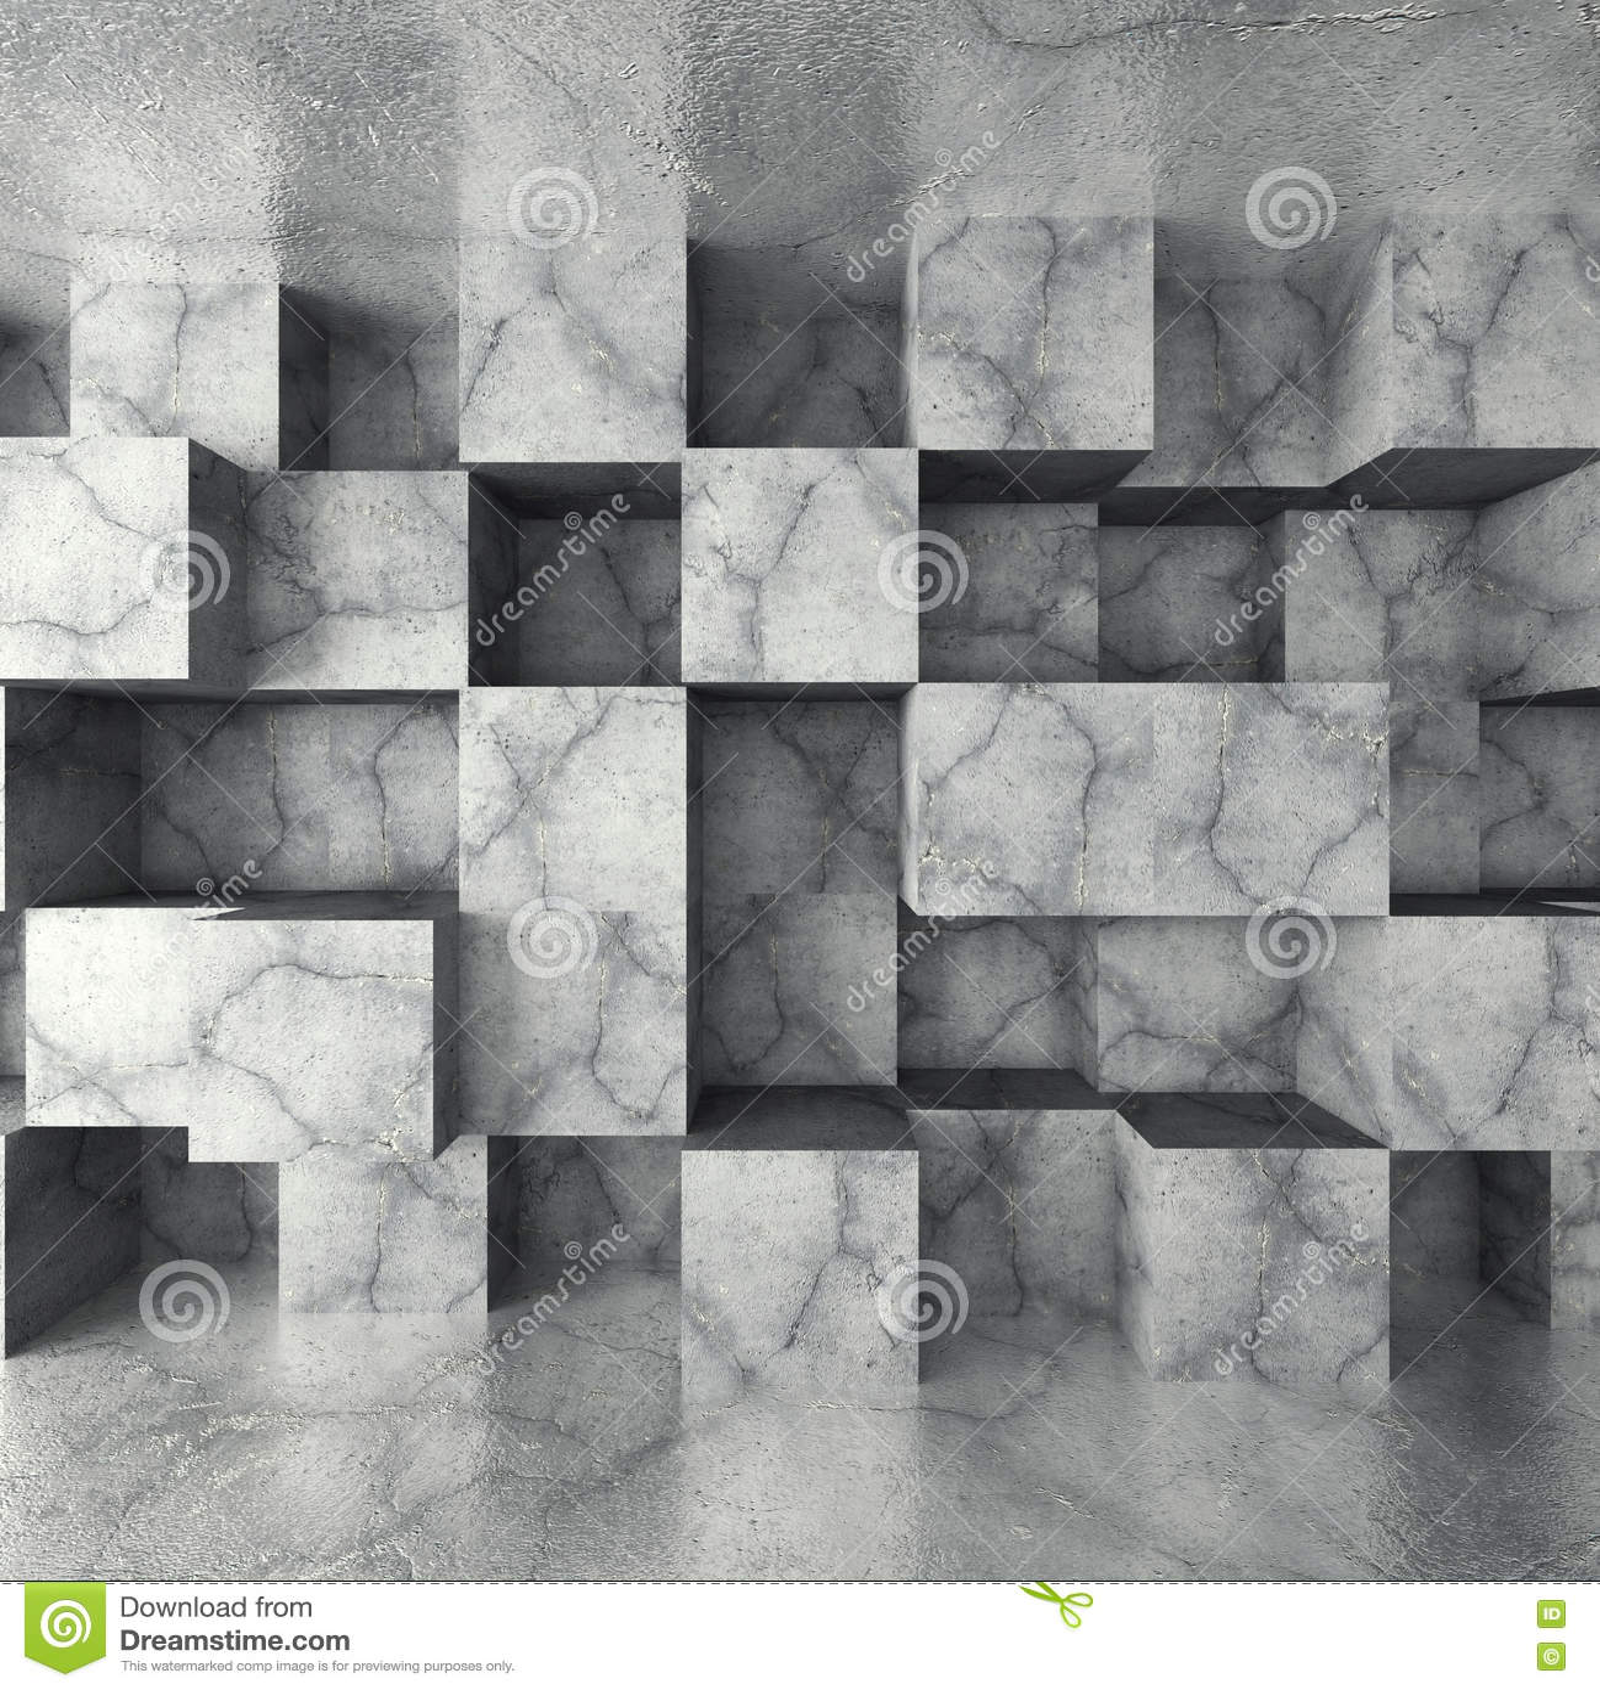 Konkret mörker tömmer rum med den kaotiska kubväggen Arkitektur b